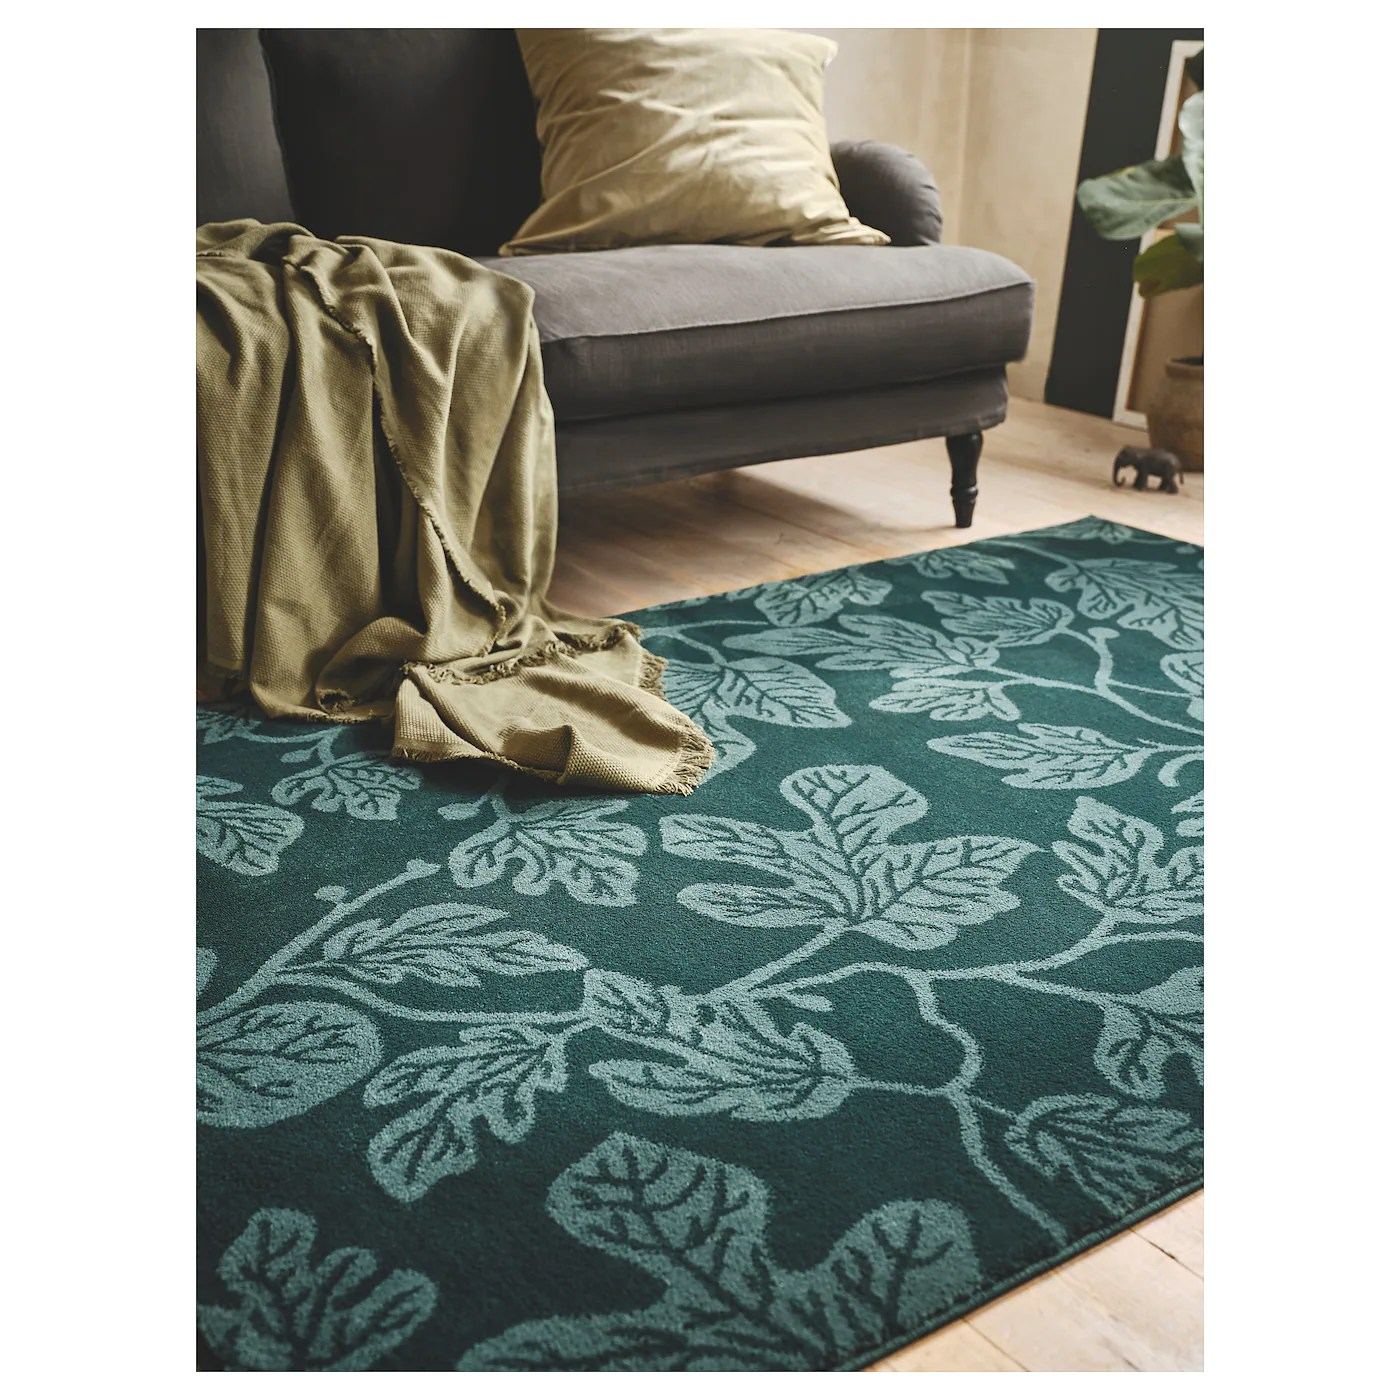 ikea porte tapis belle turquoise sol